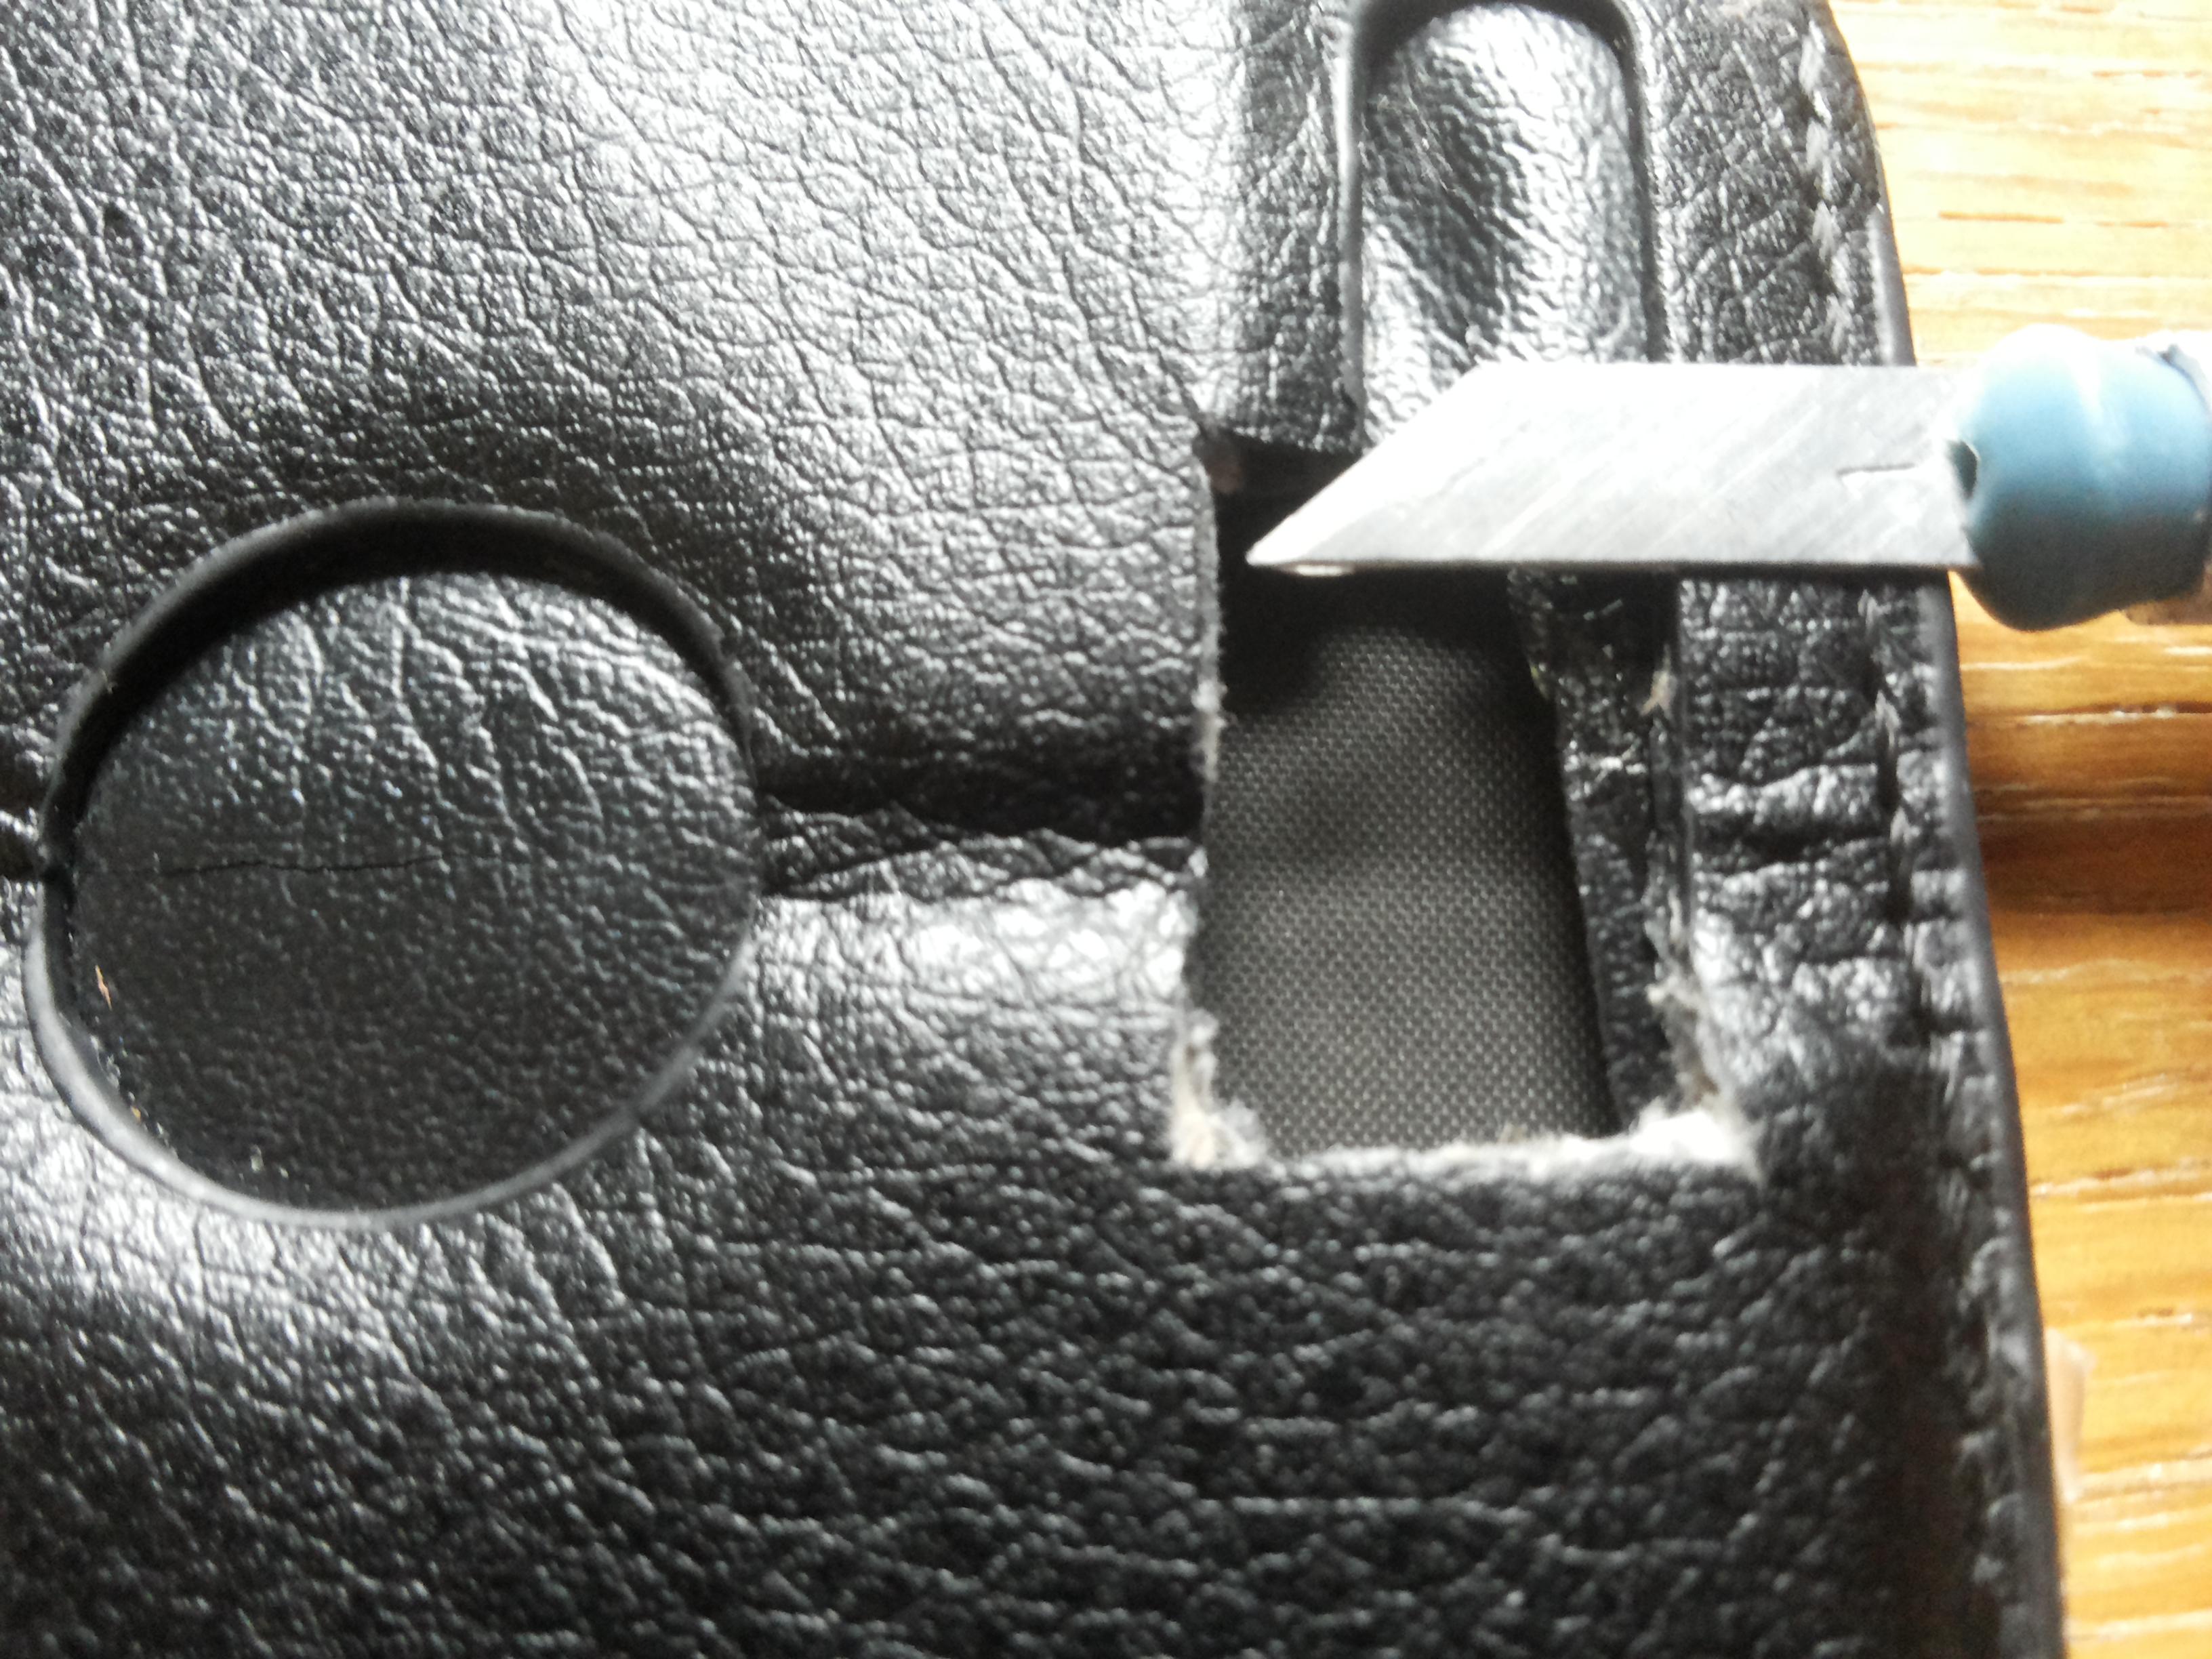 Picture of Create Holes for Camera/ Speaker/ Etc.